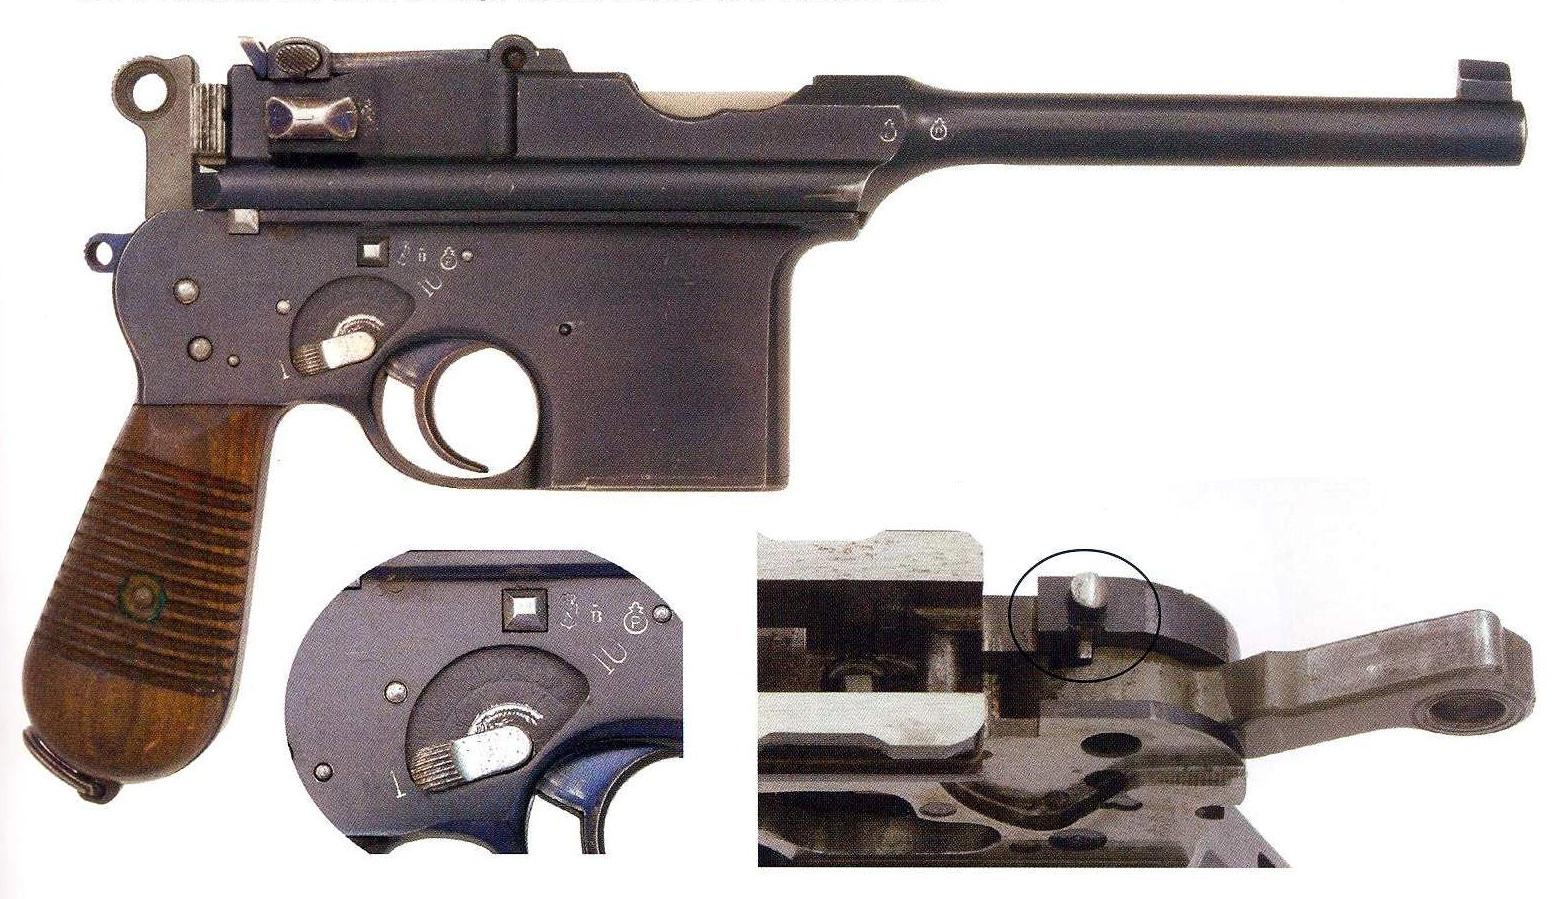 Pistole Astra Model 901